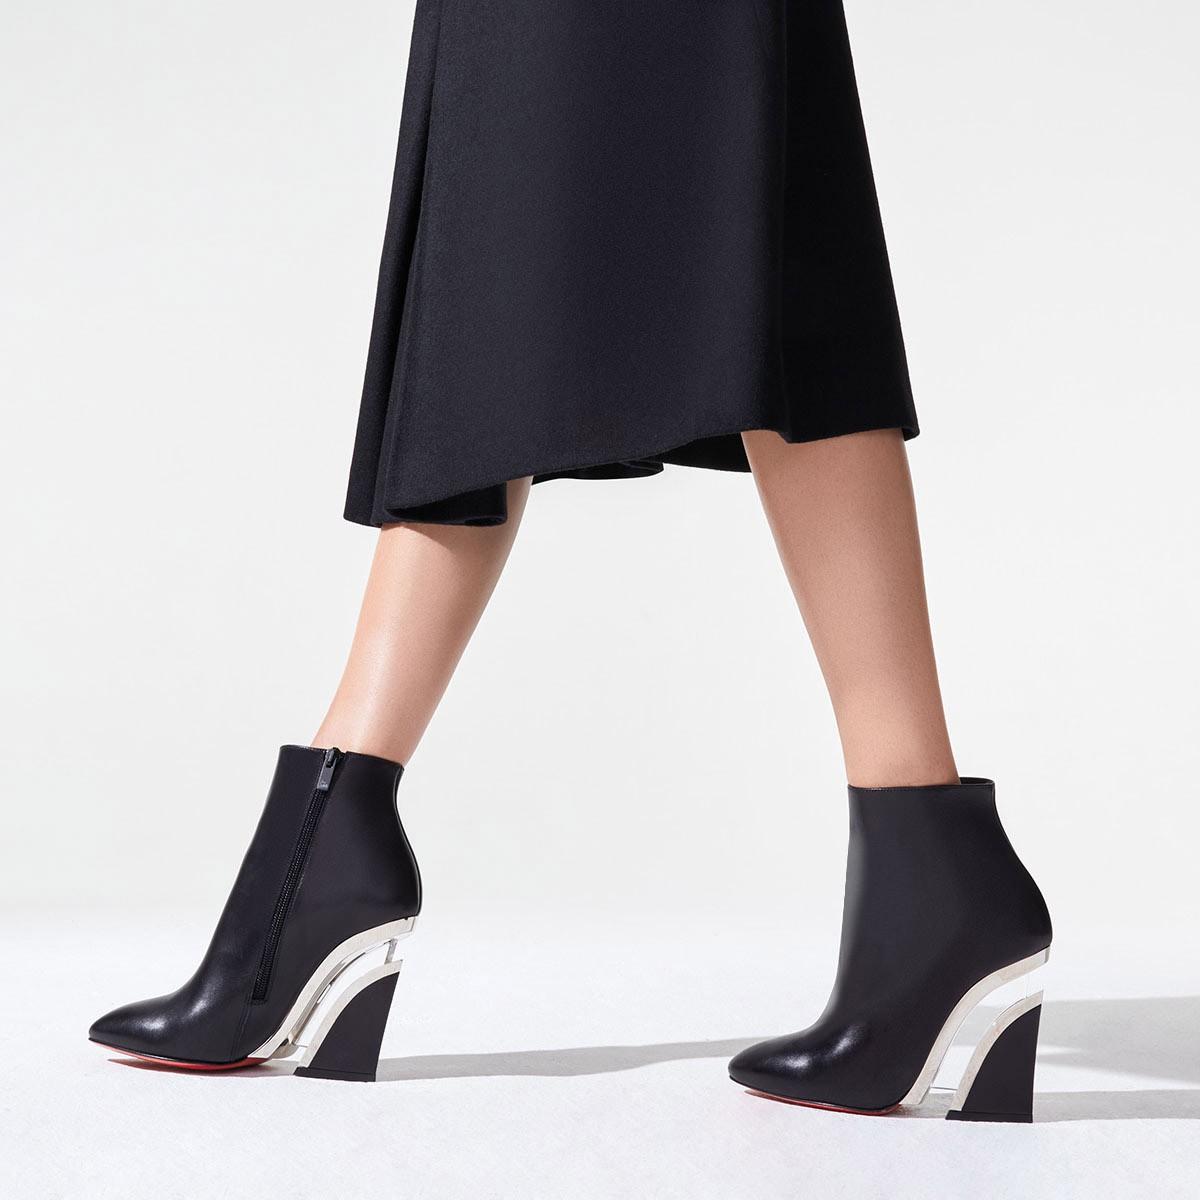 Shoes - Levitibootie - Christian Louboutin